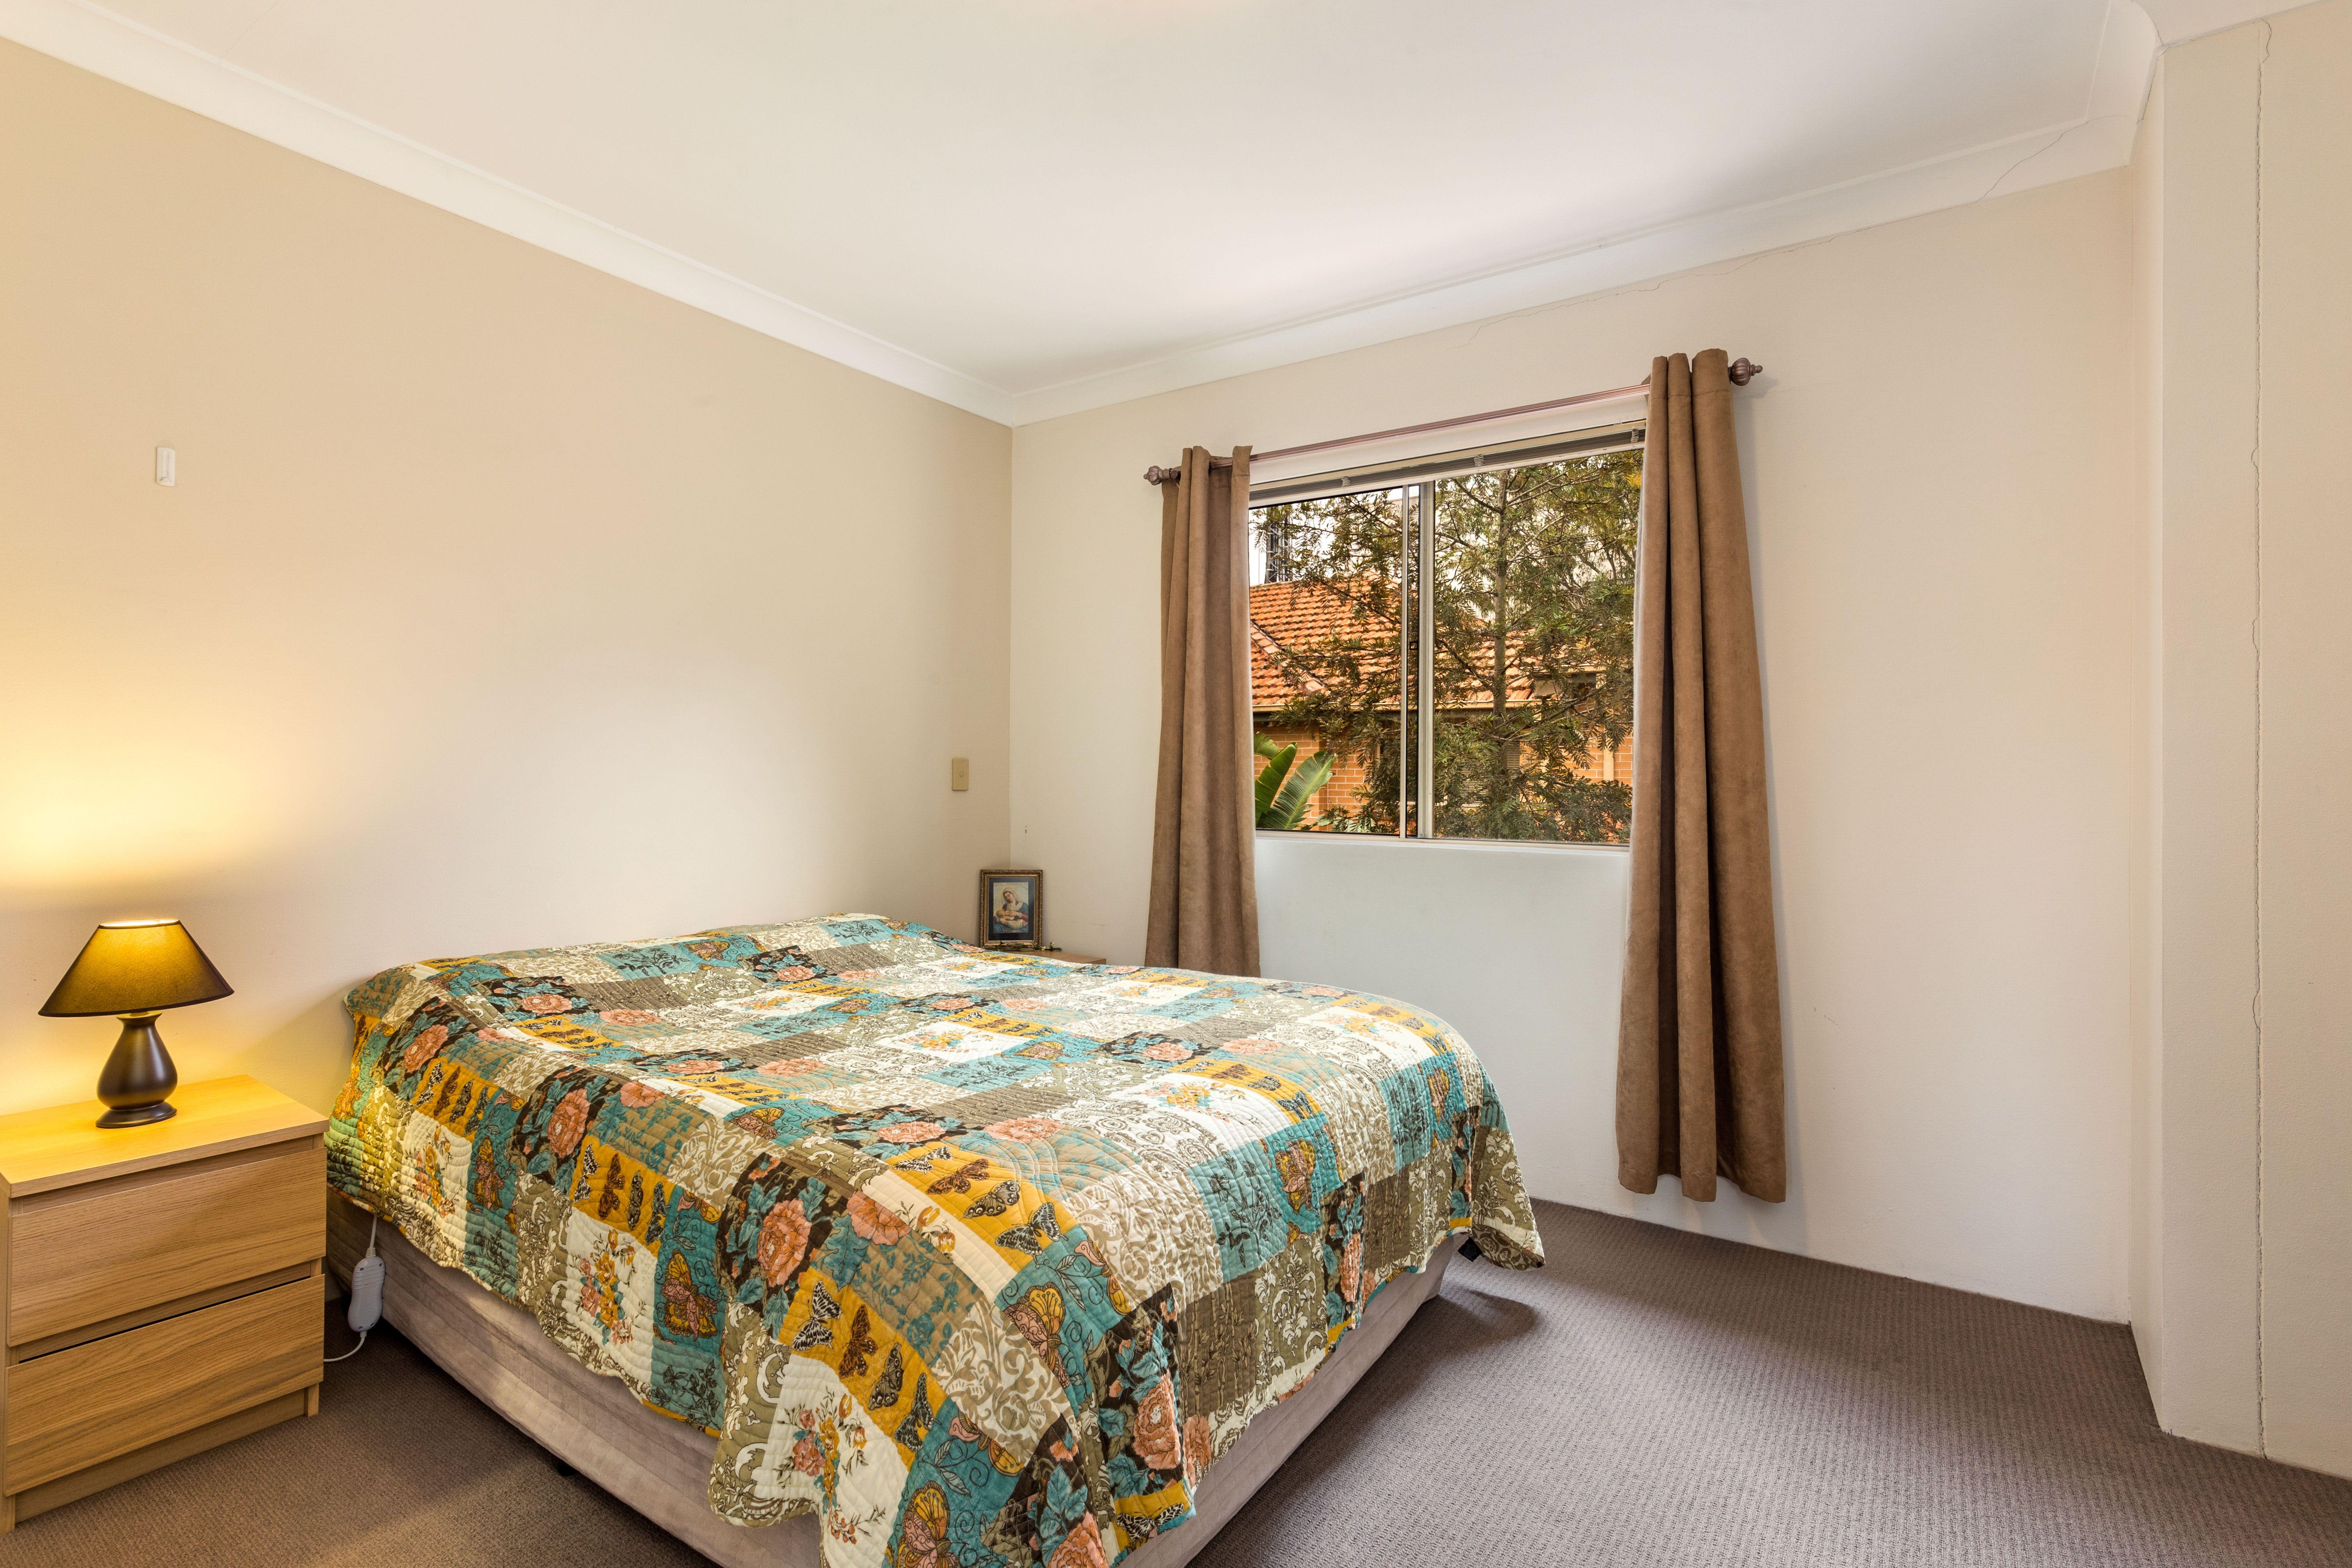 11/76-80 Beresford Road, Strathfield NSW 2135